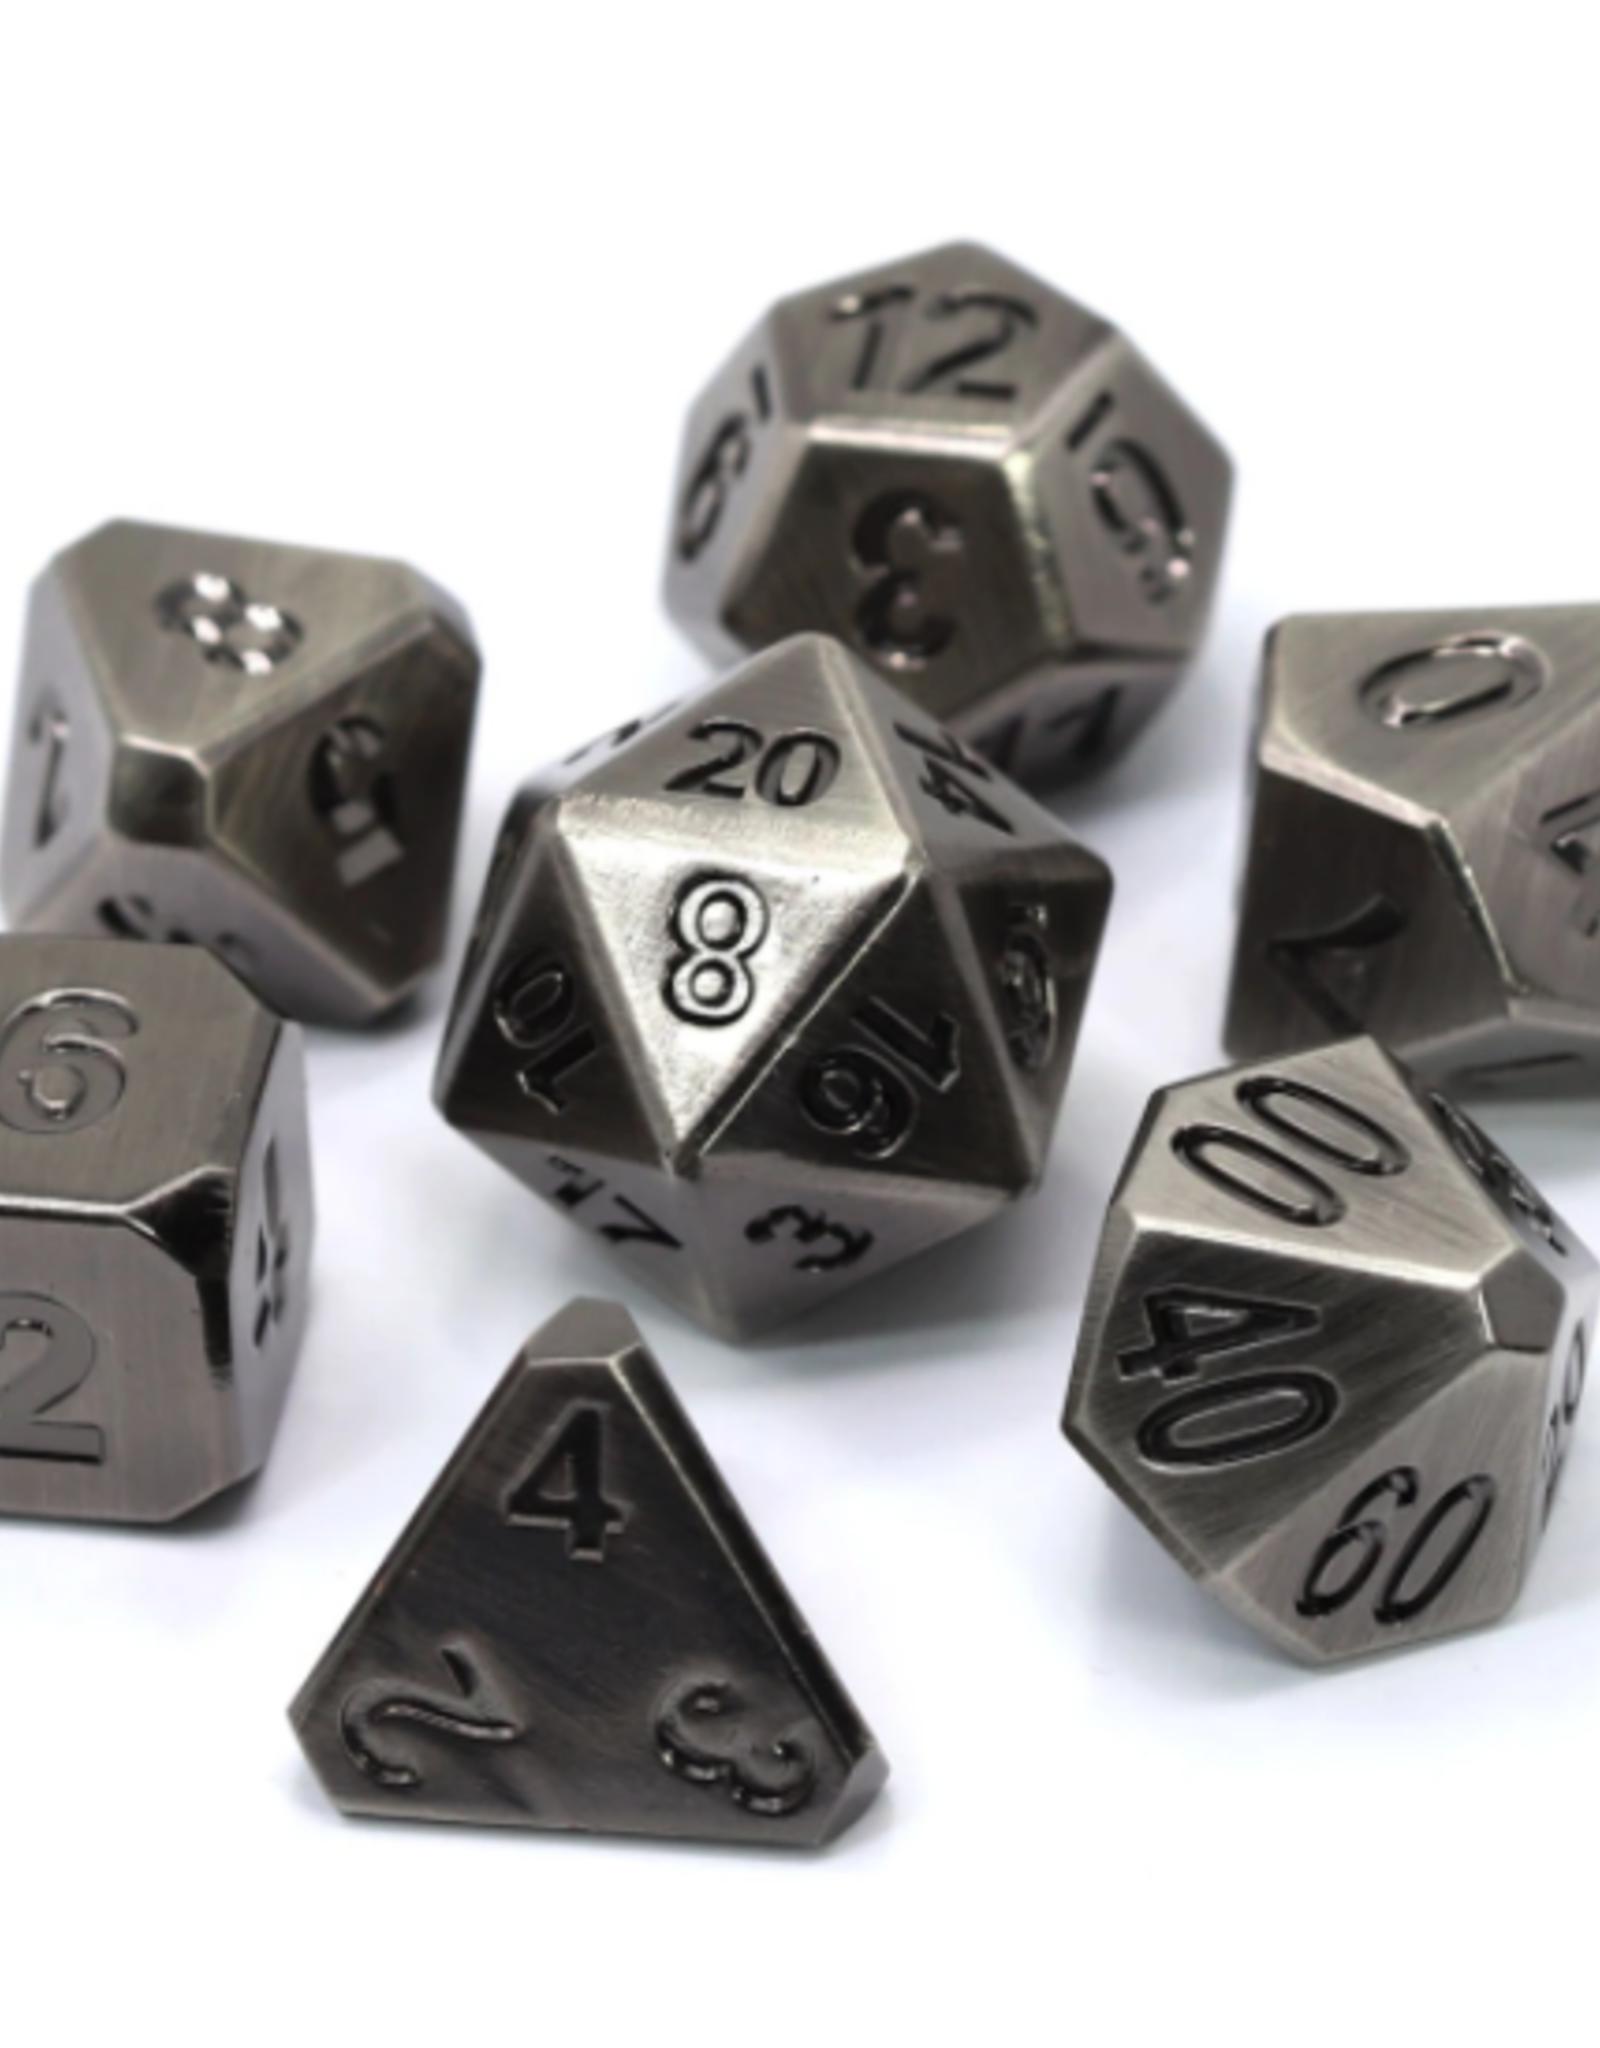 Die Hard Dice Metal Dice 7 set Forge Battleworn Silver